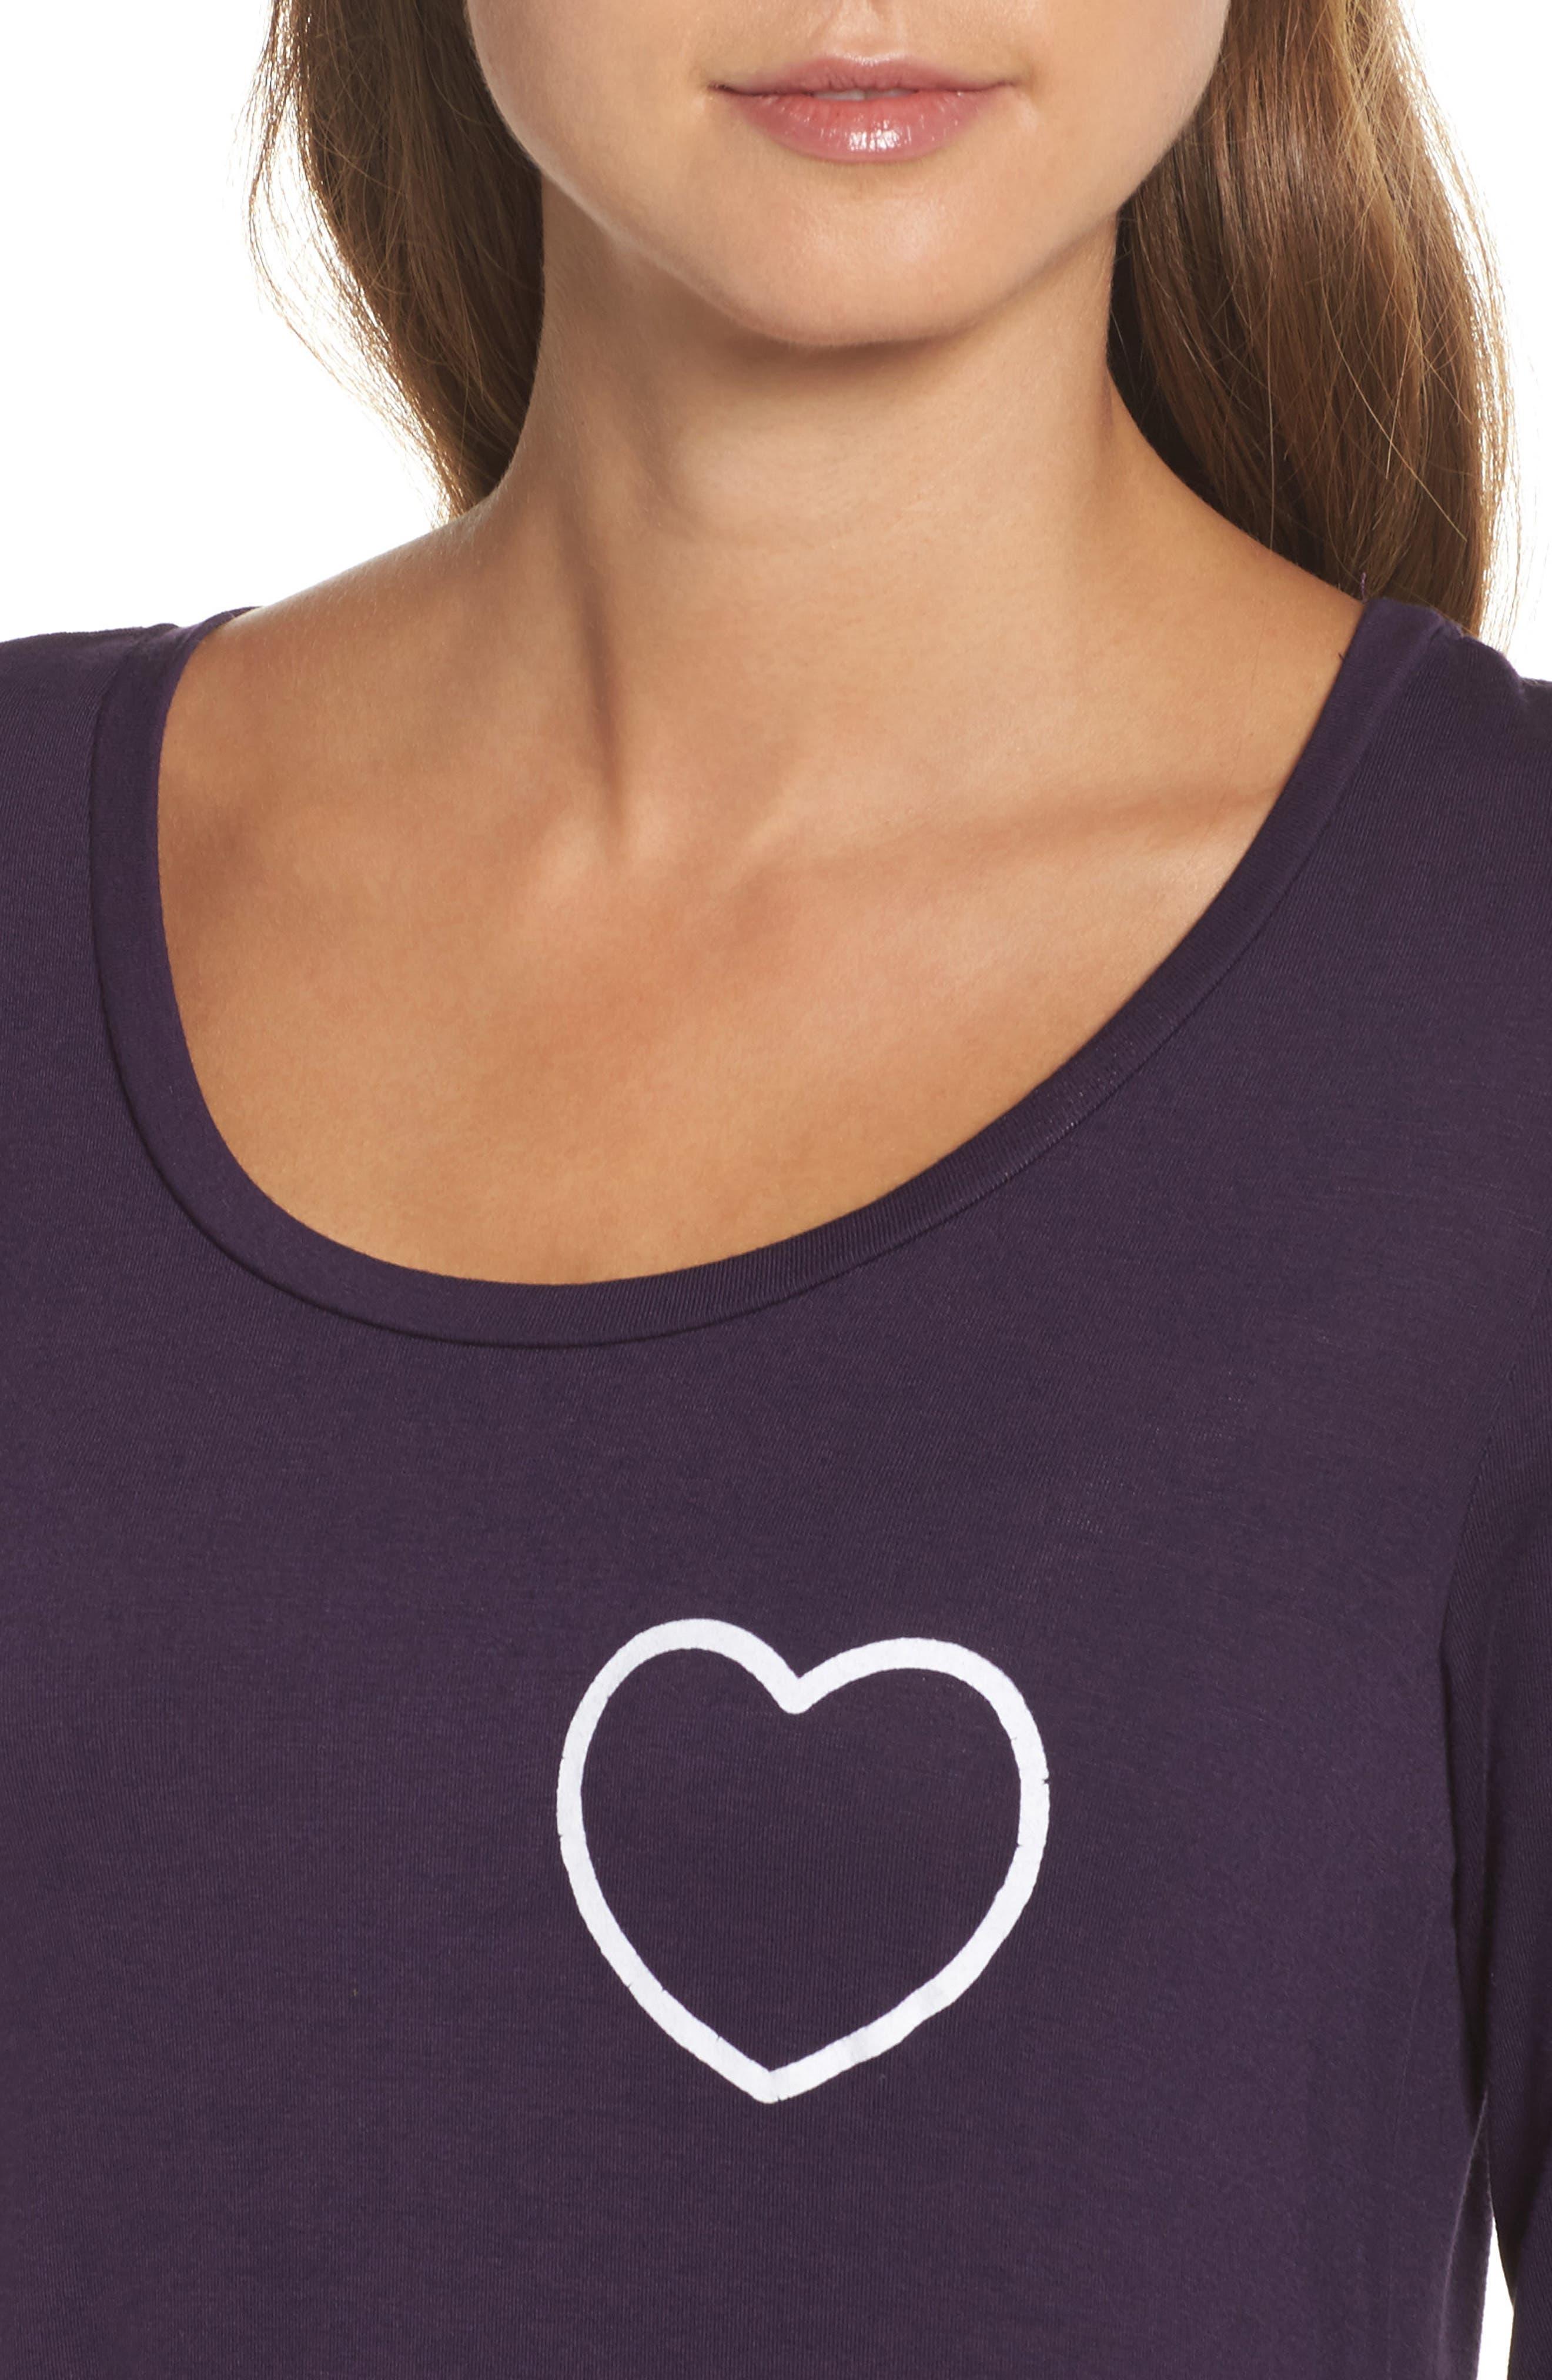 Heart Sleep Shirt,                             Alternate thumbnail 4, color,                             503